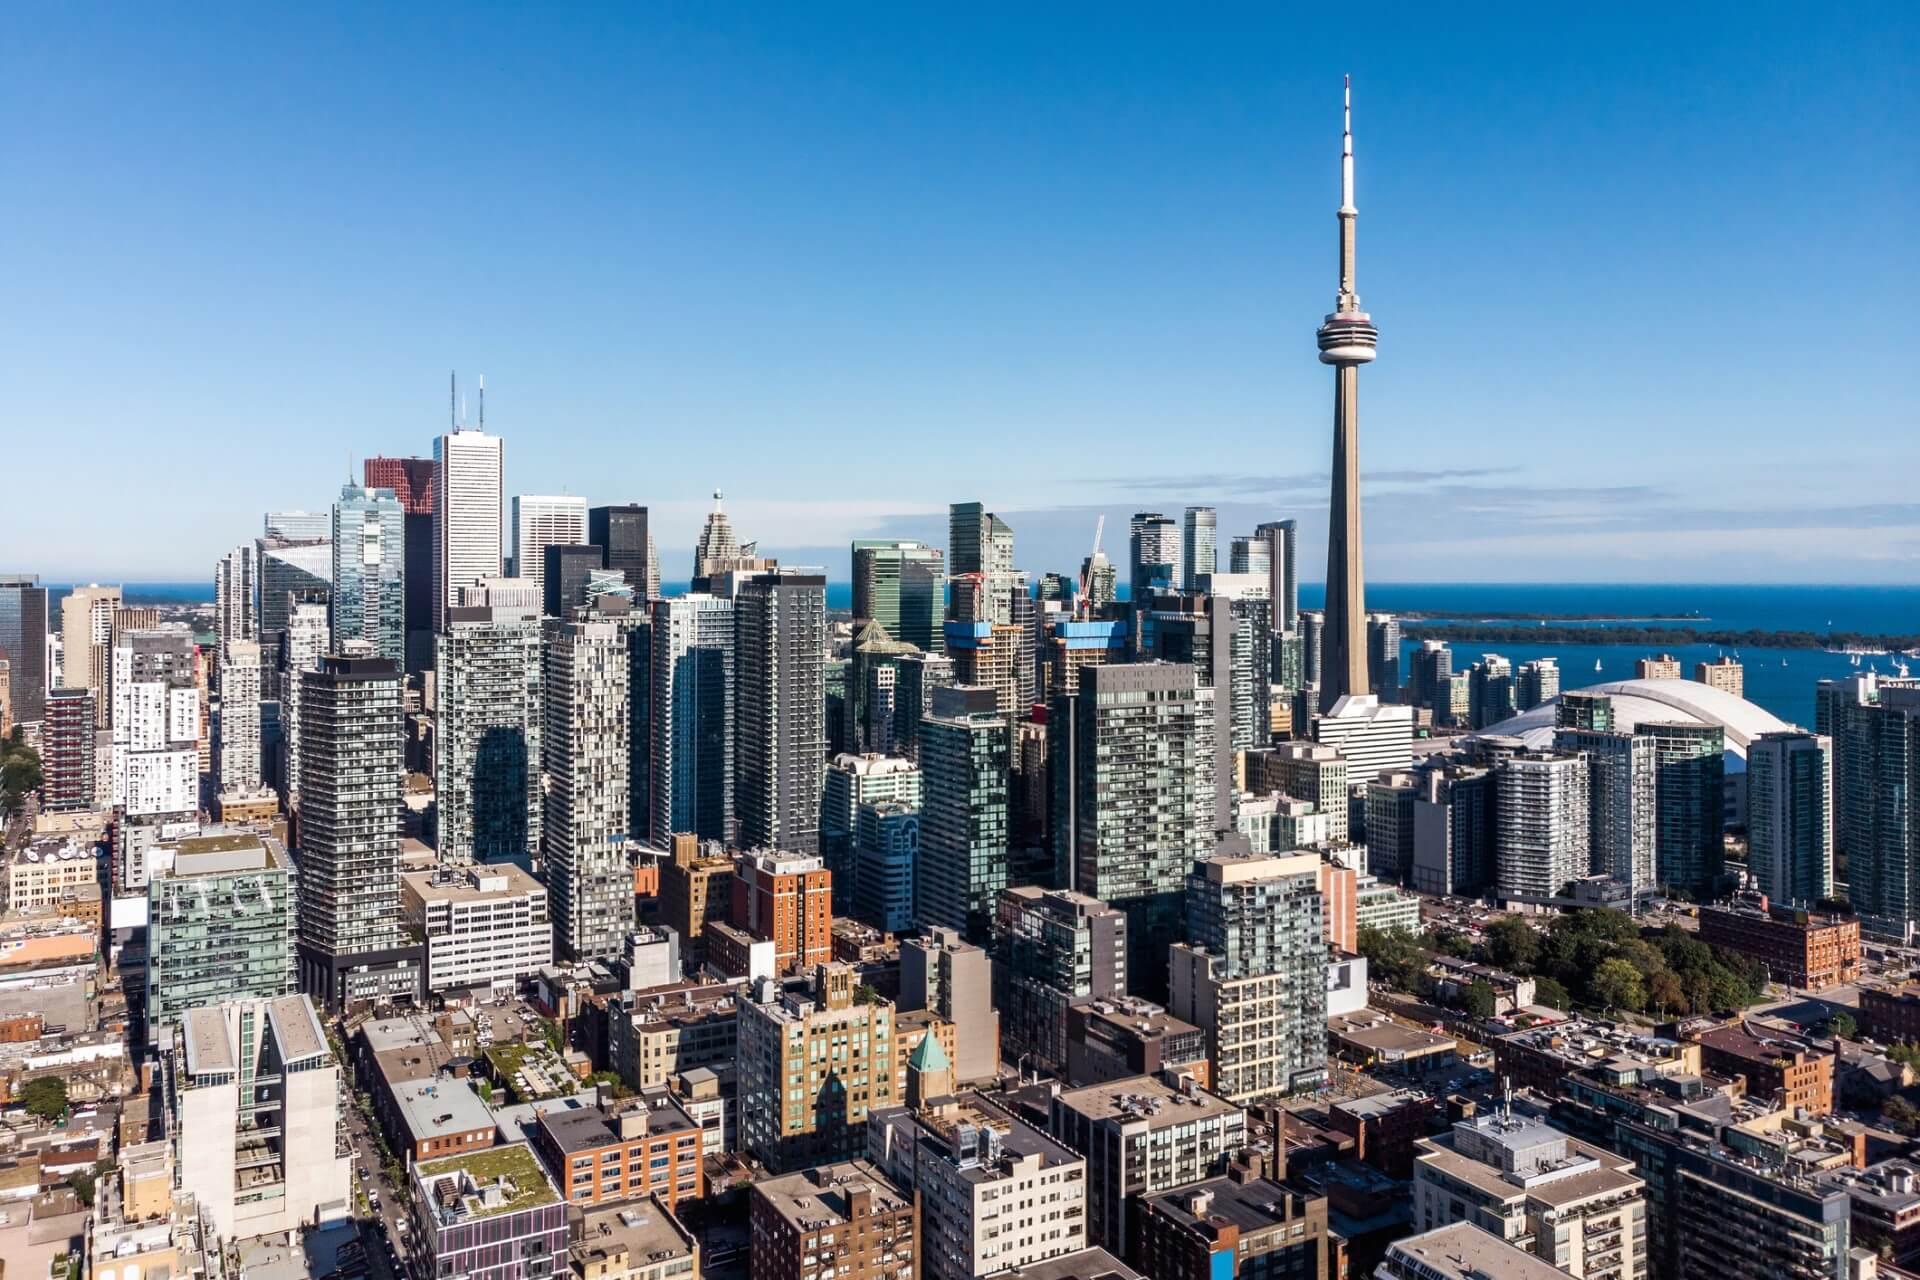 The Toronto city skyline.